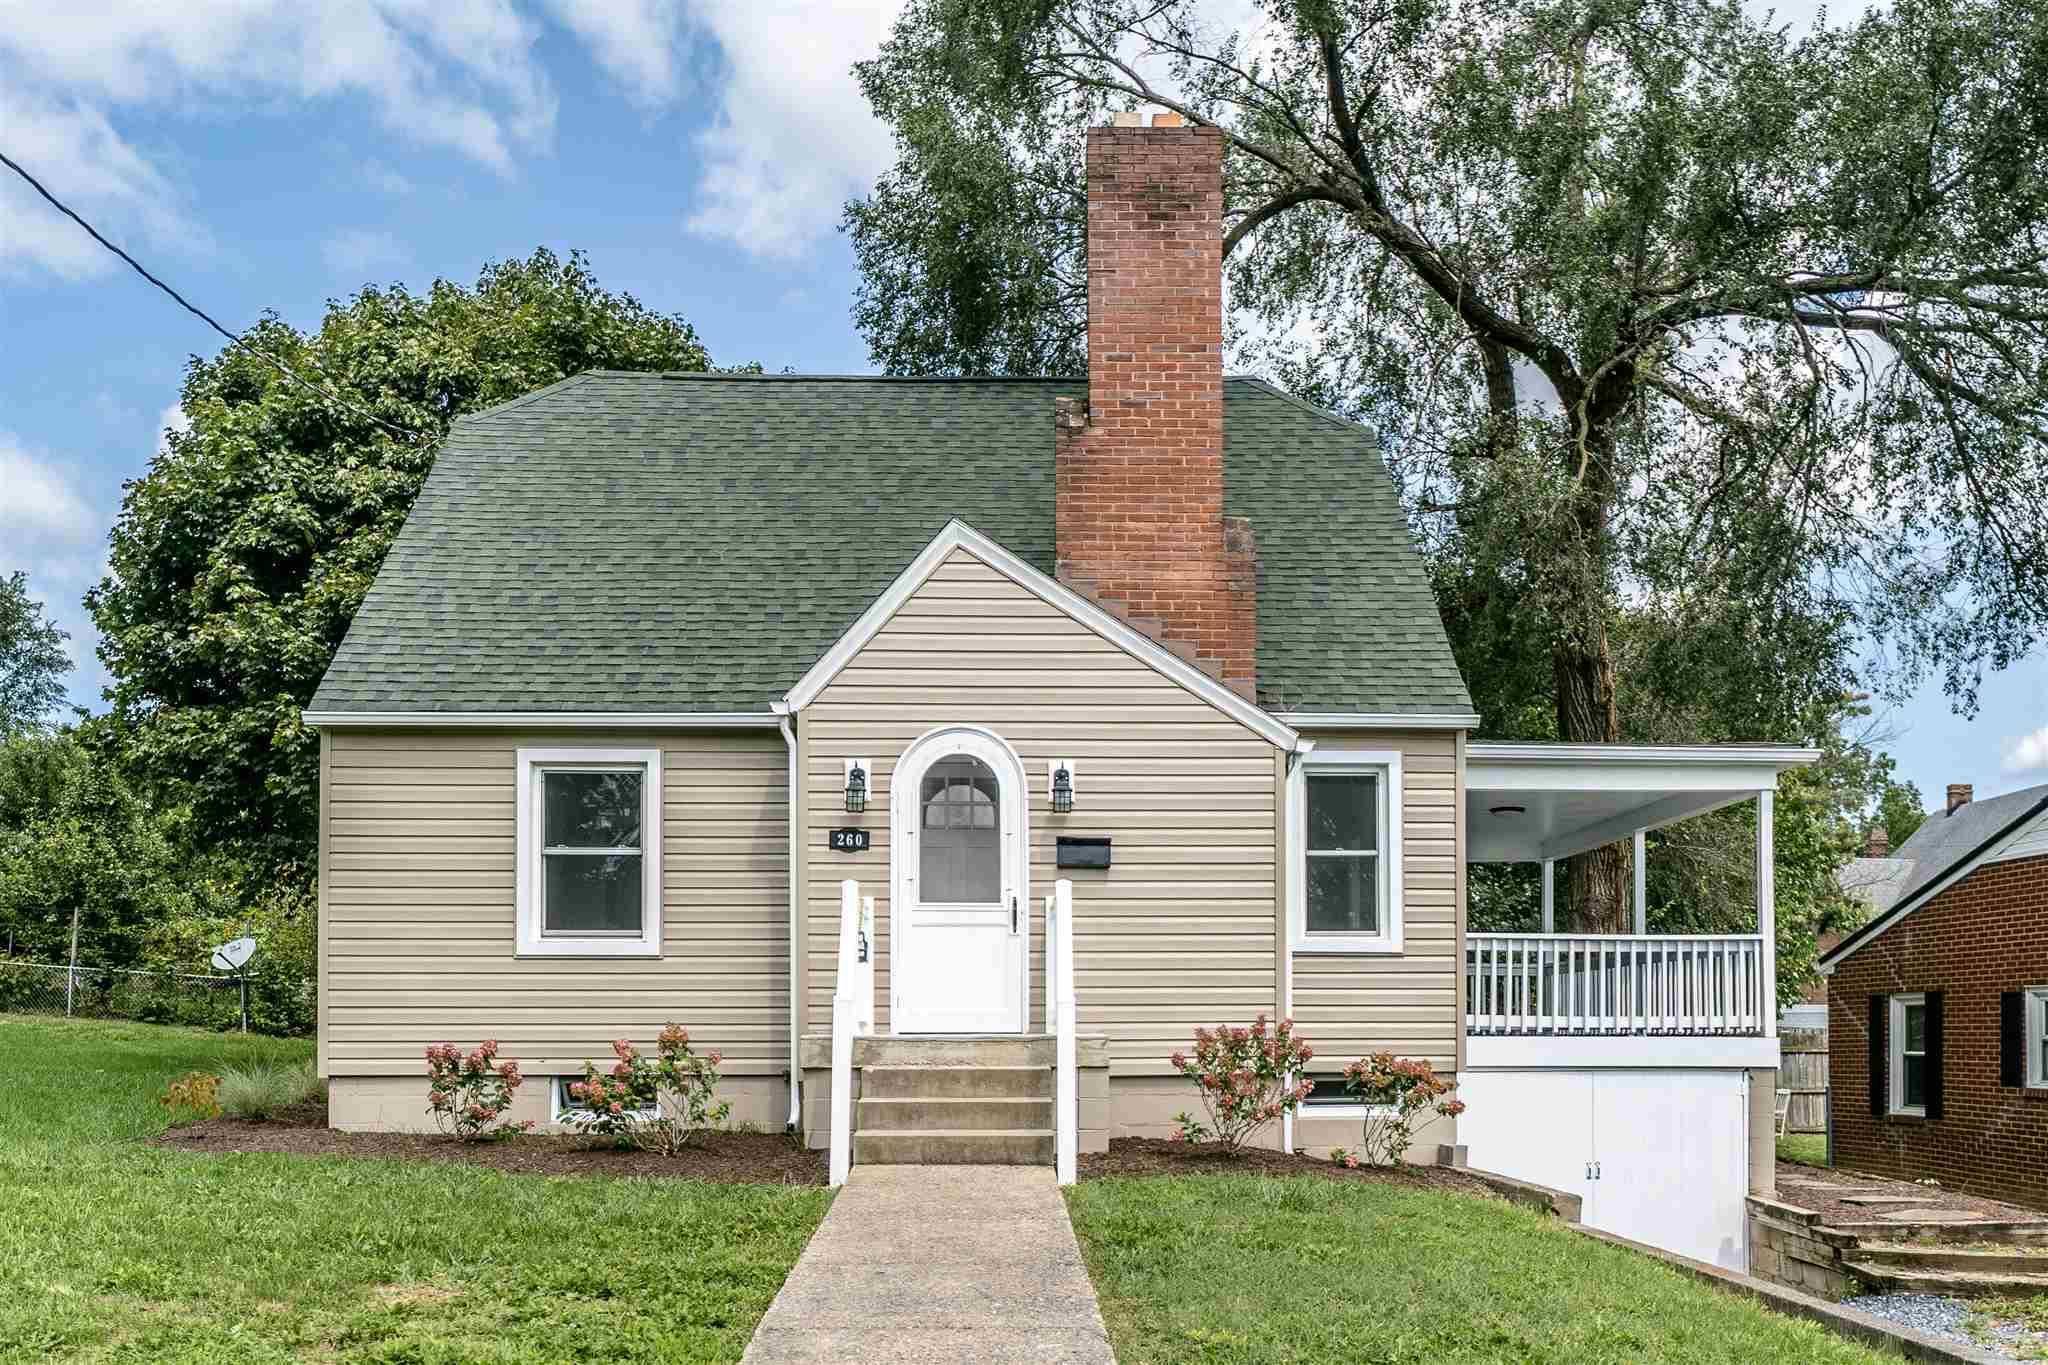 $278,500 - 3Br/2Ba -  for Sale in None, Harrisonburg